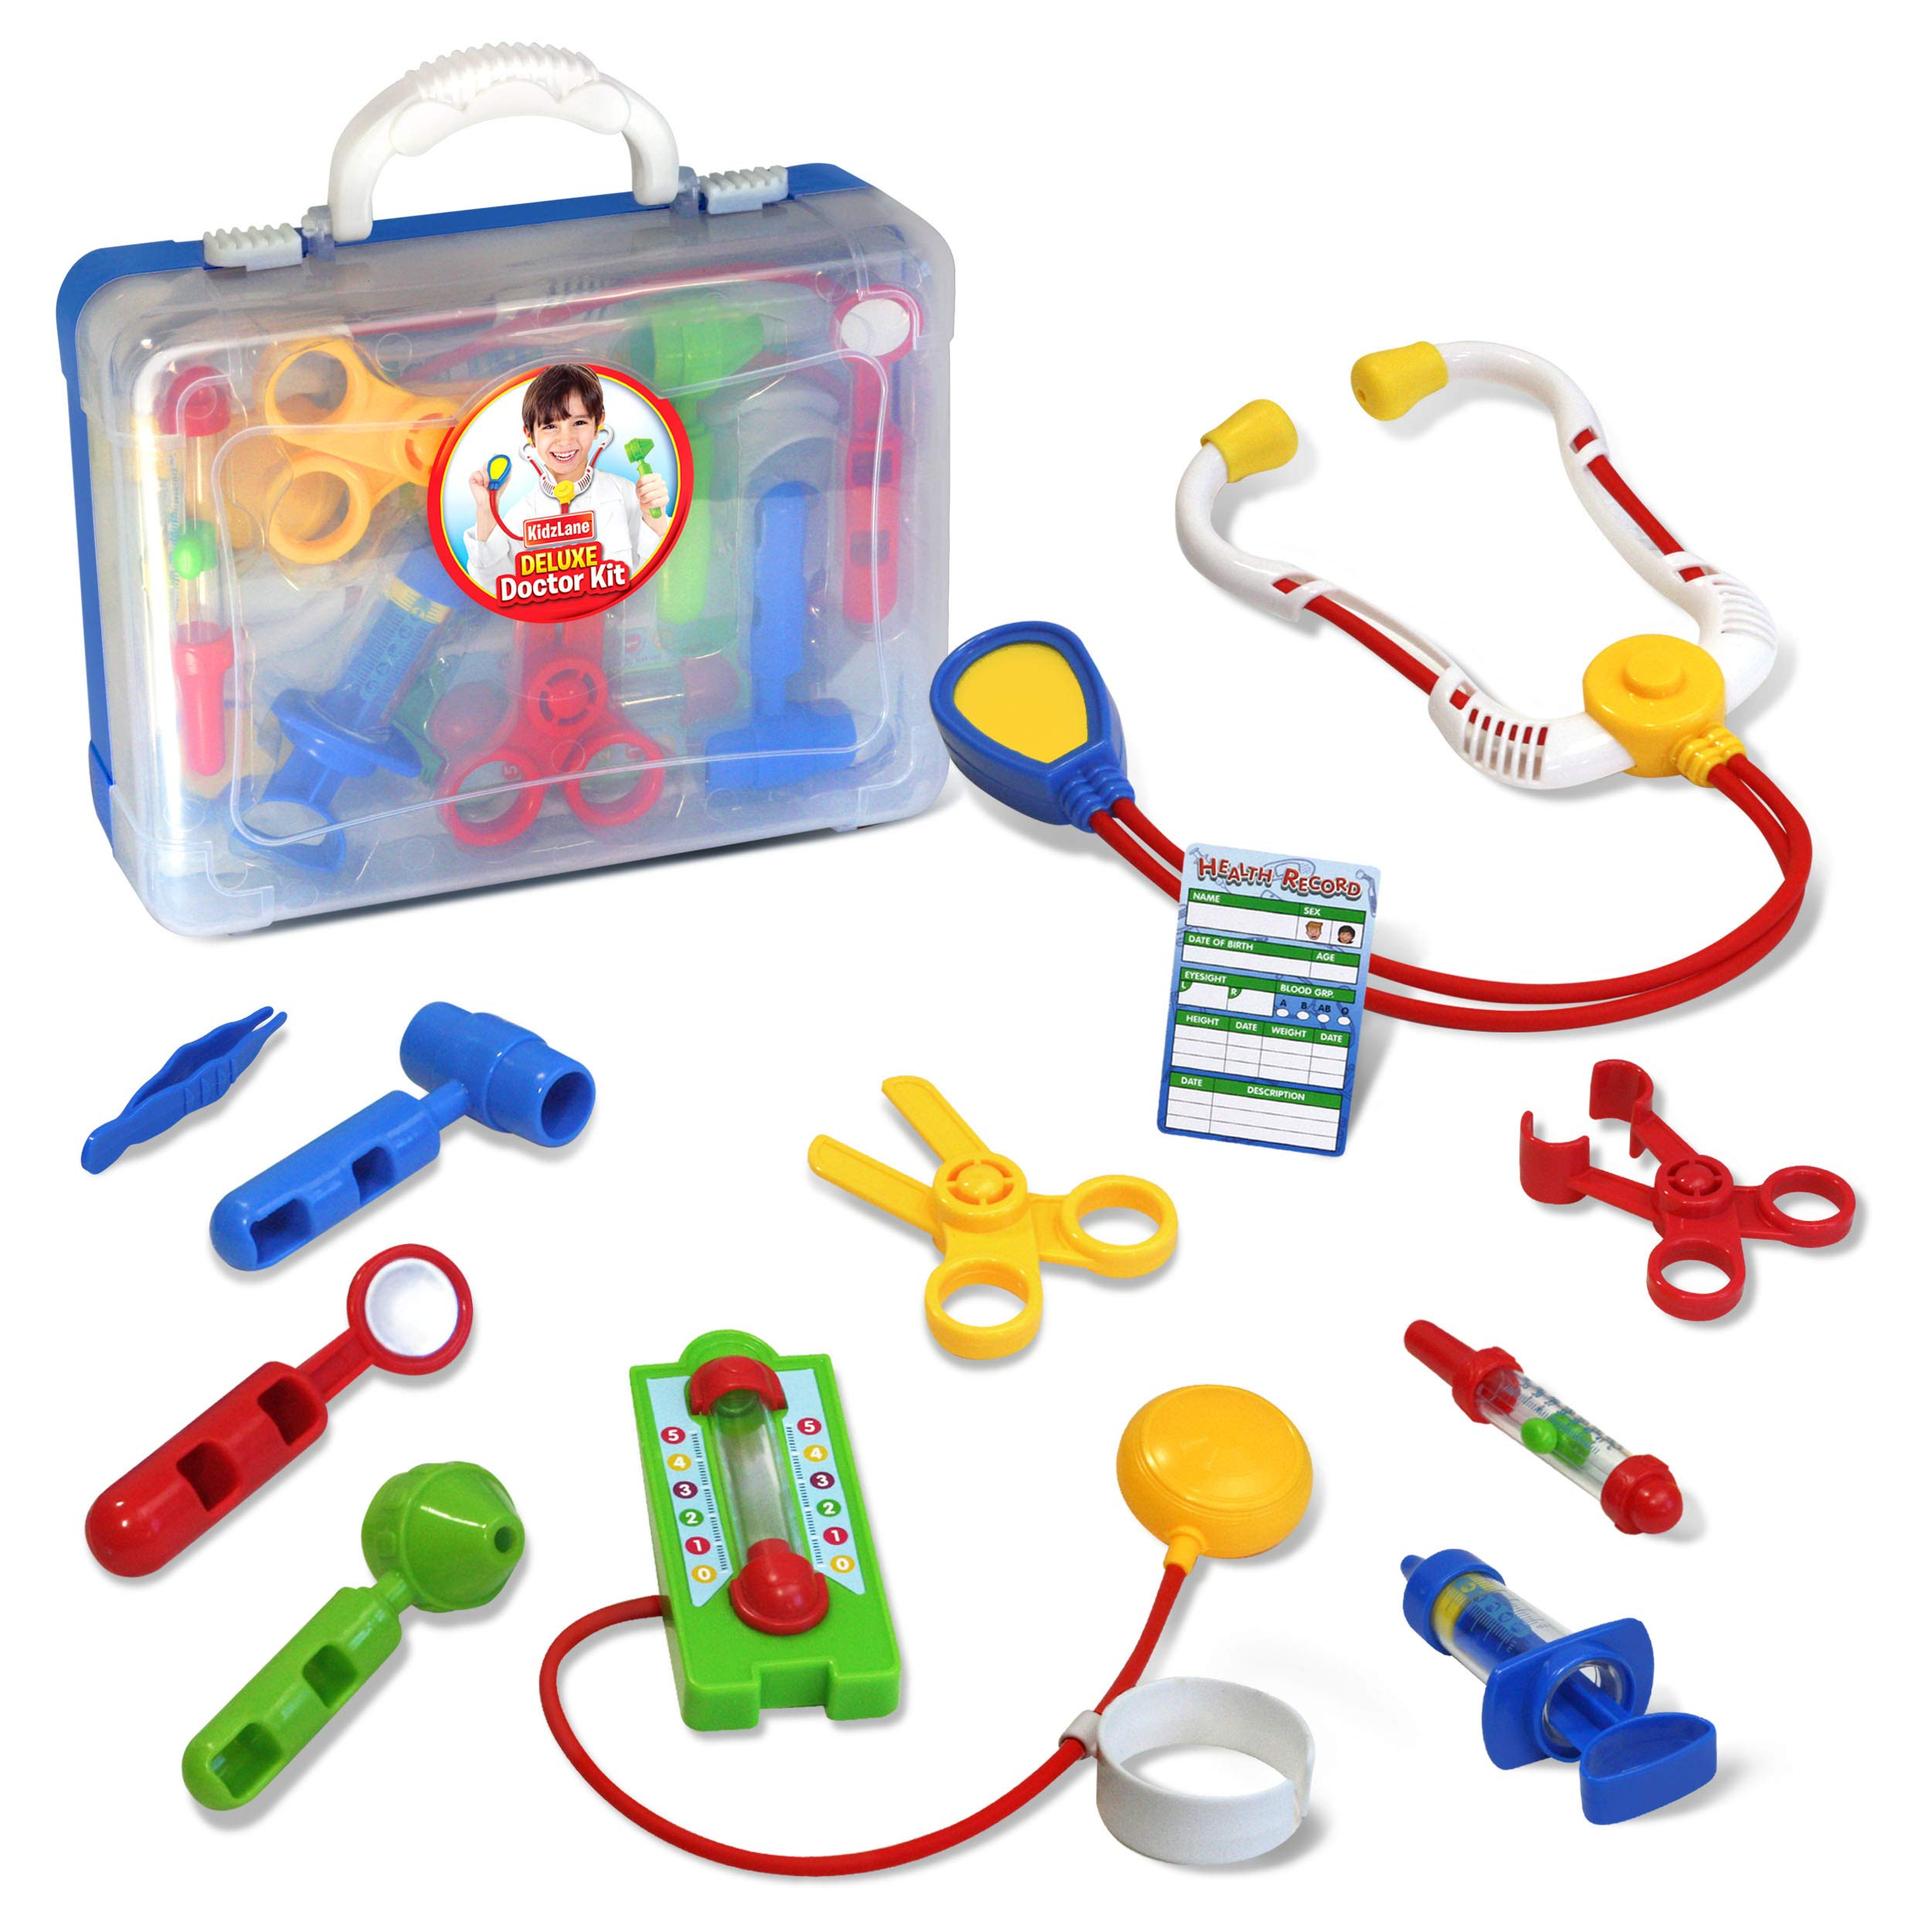 Kidzlane Deluxe Doctor Medical Kit - Pretend Play Set for Kids by Kidzlane